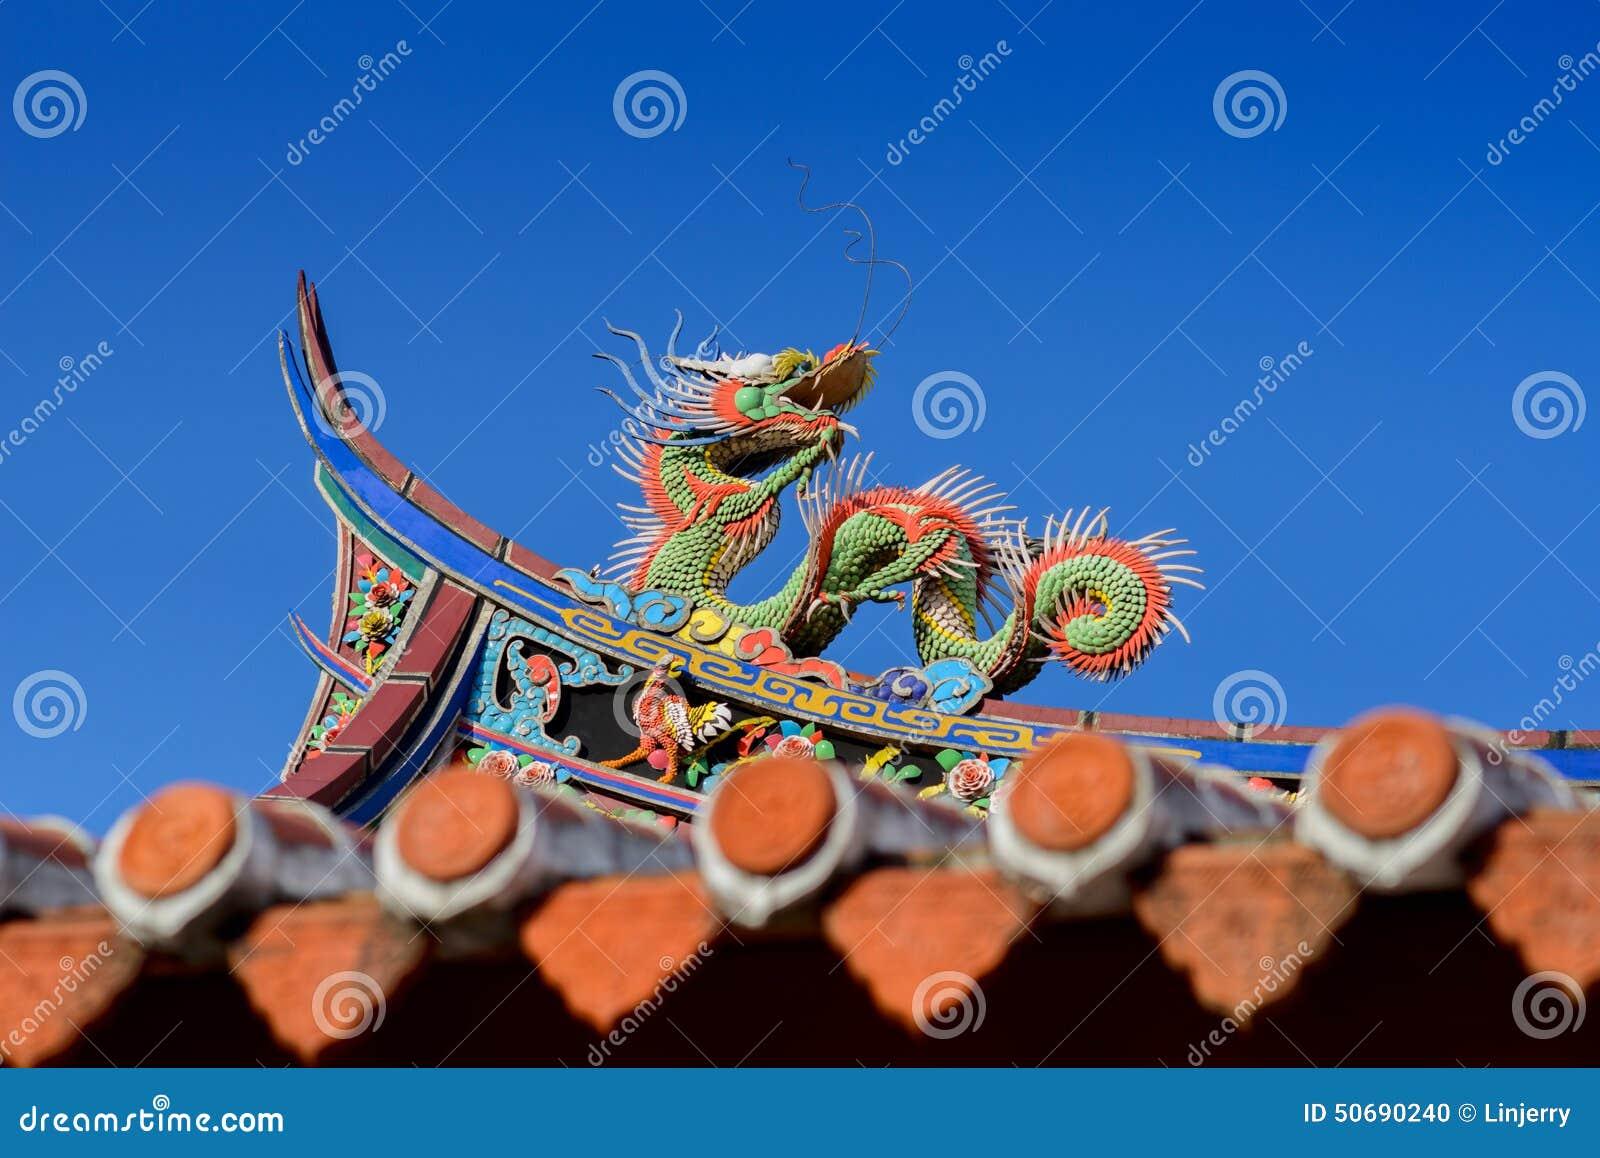 Download 在寺庙屋顶的龙 库存照片. 图片 包括有 拱道, 红色, 聚会所, 装饰品, 蓝色, 屋顶, 敌意, 天空 - 50690240